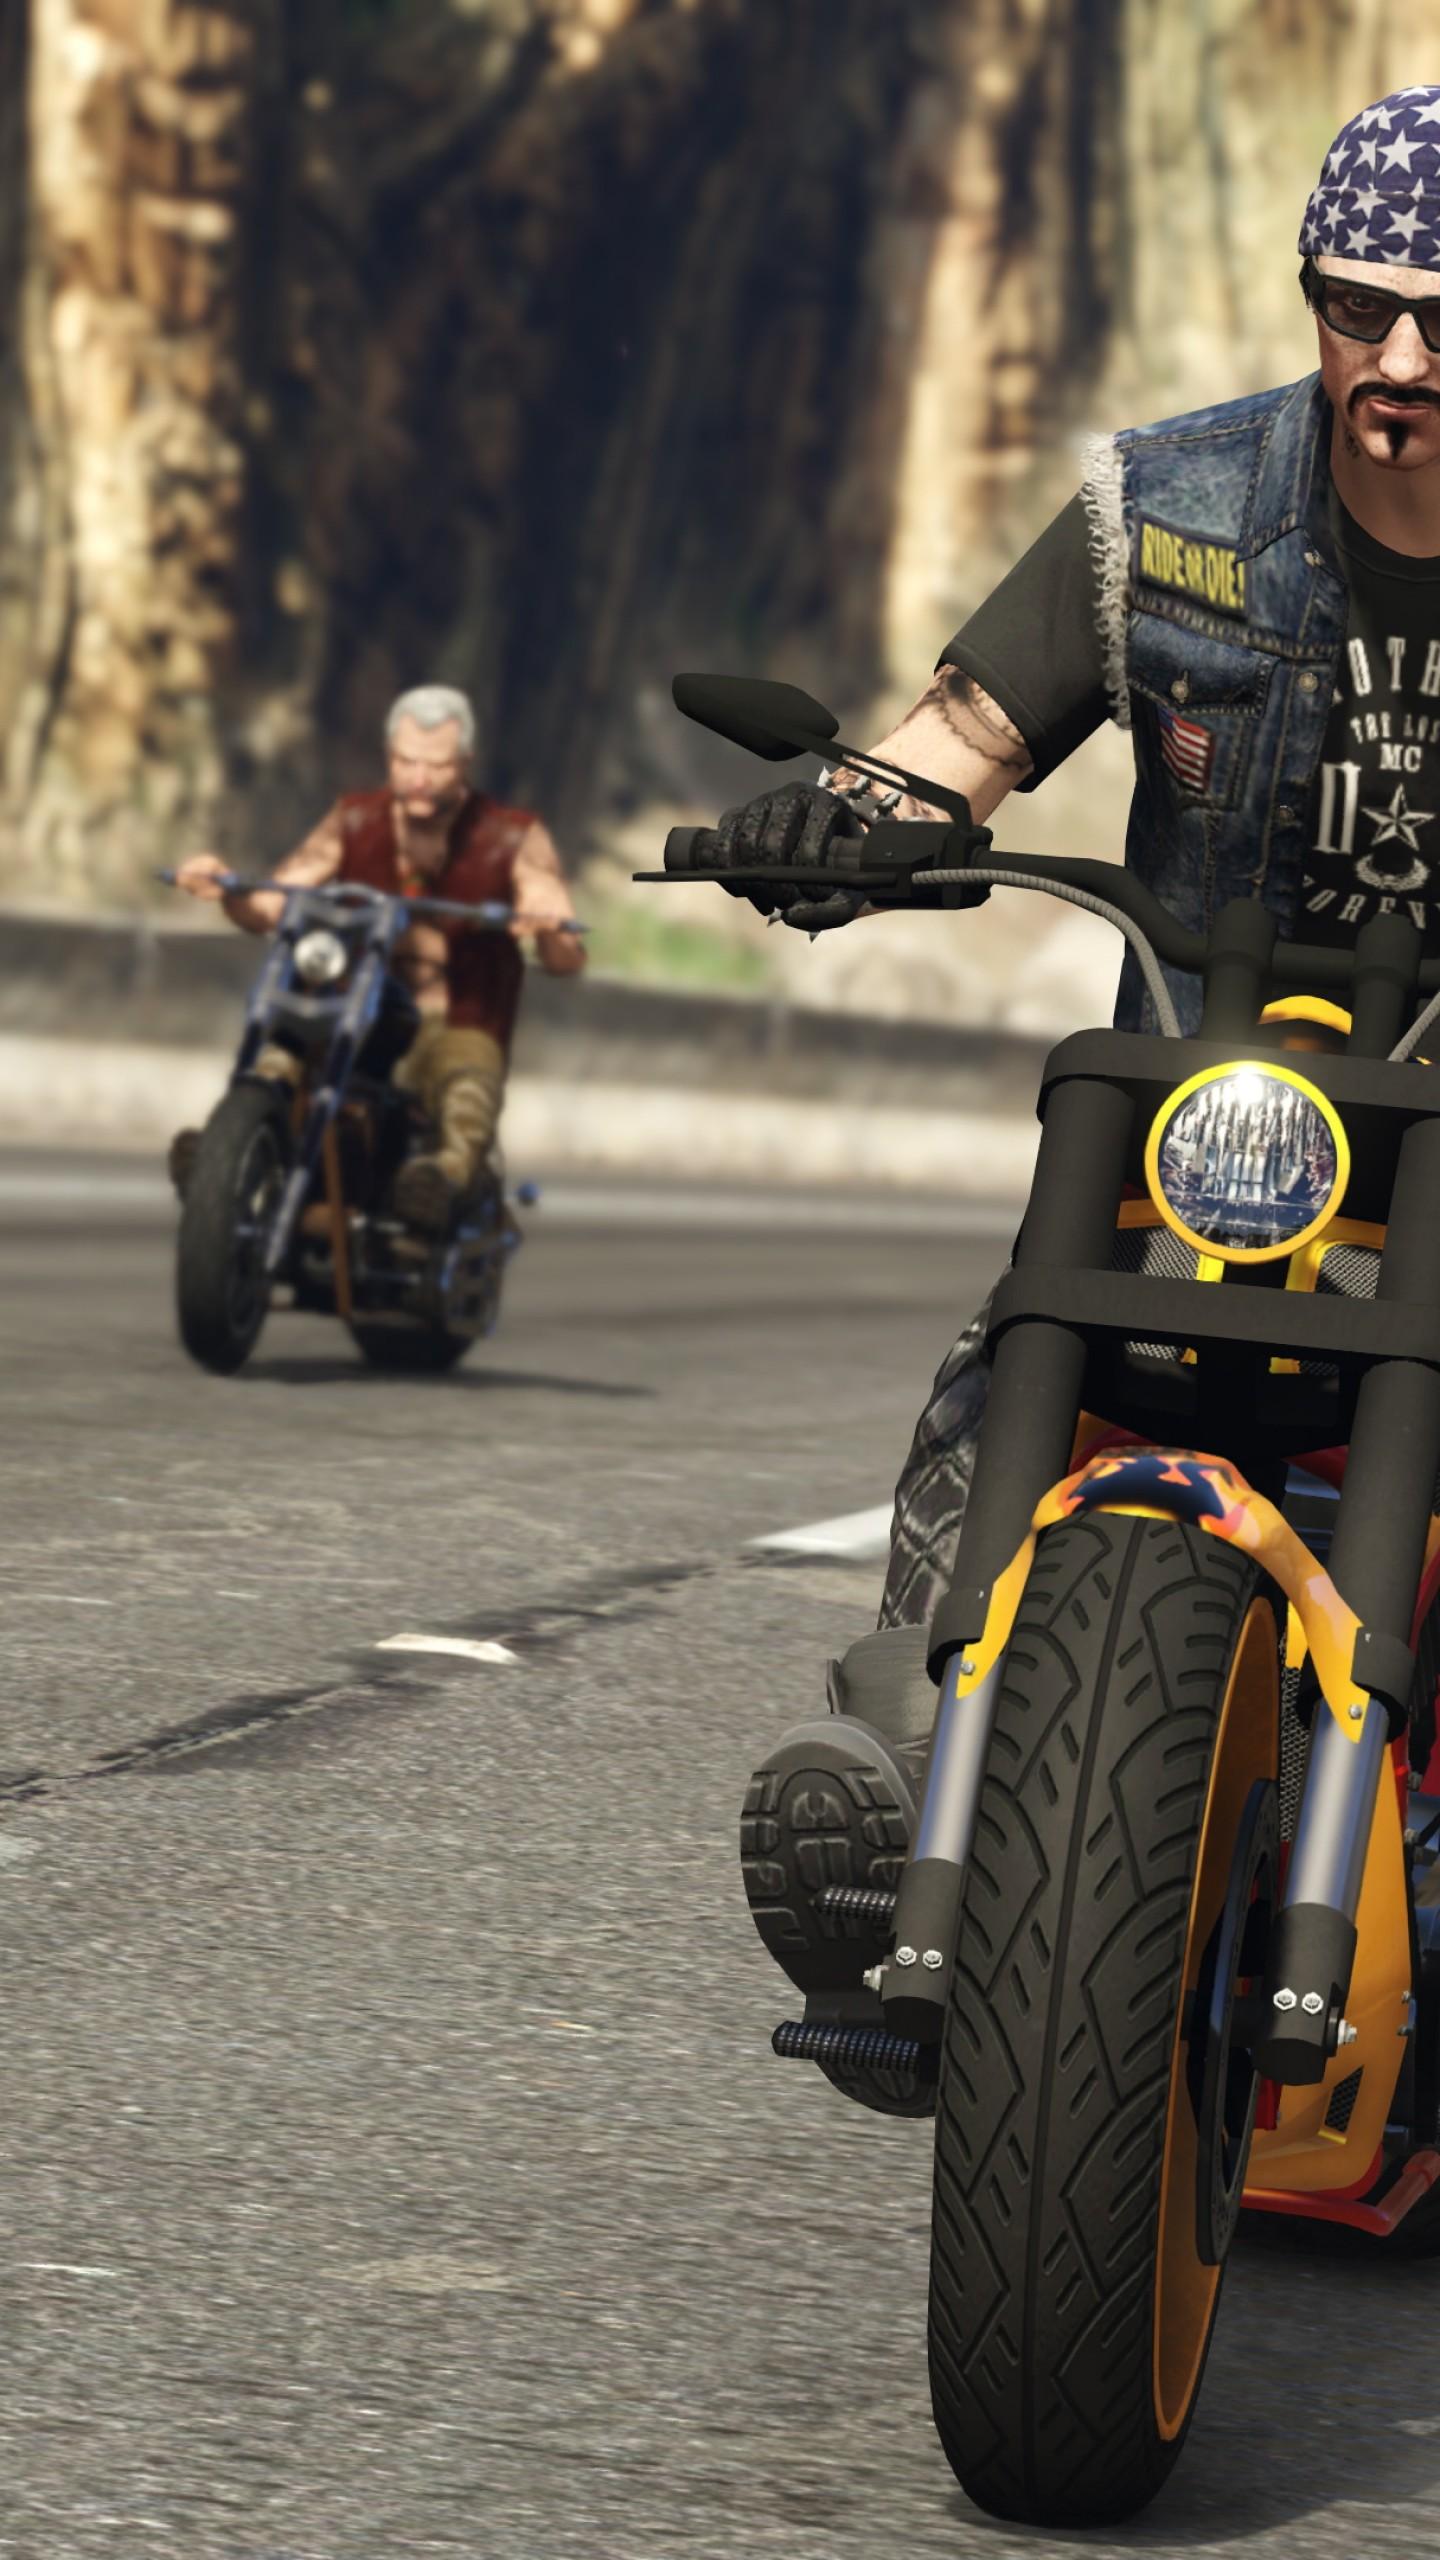 wallpaper gta online: bikers, gta, gta 5, best games, games #11812